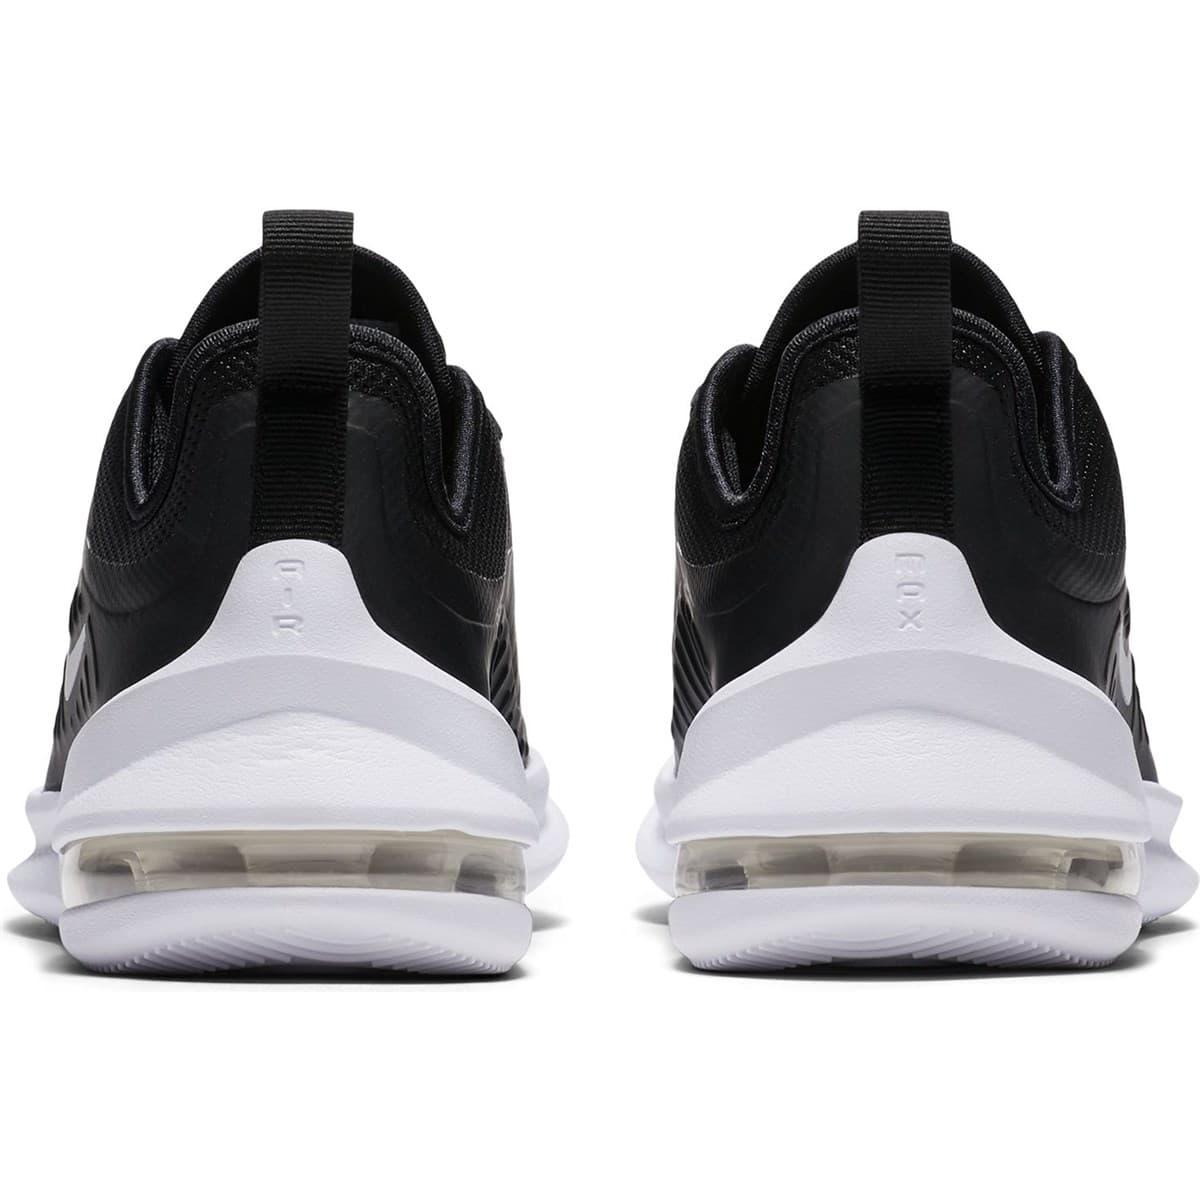 Air Max Axis Siyah Kadın Spor Ayakkabı